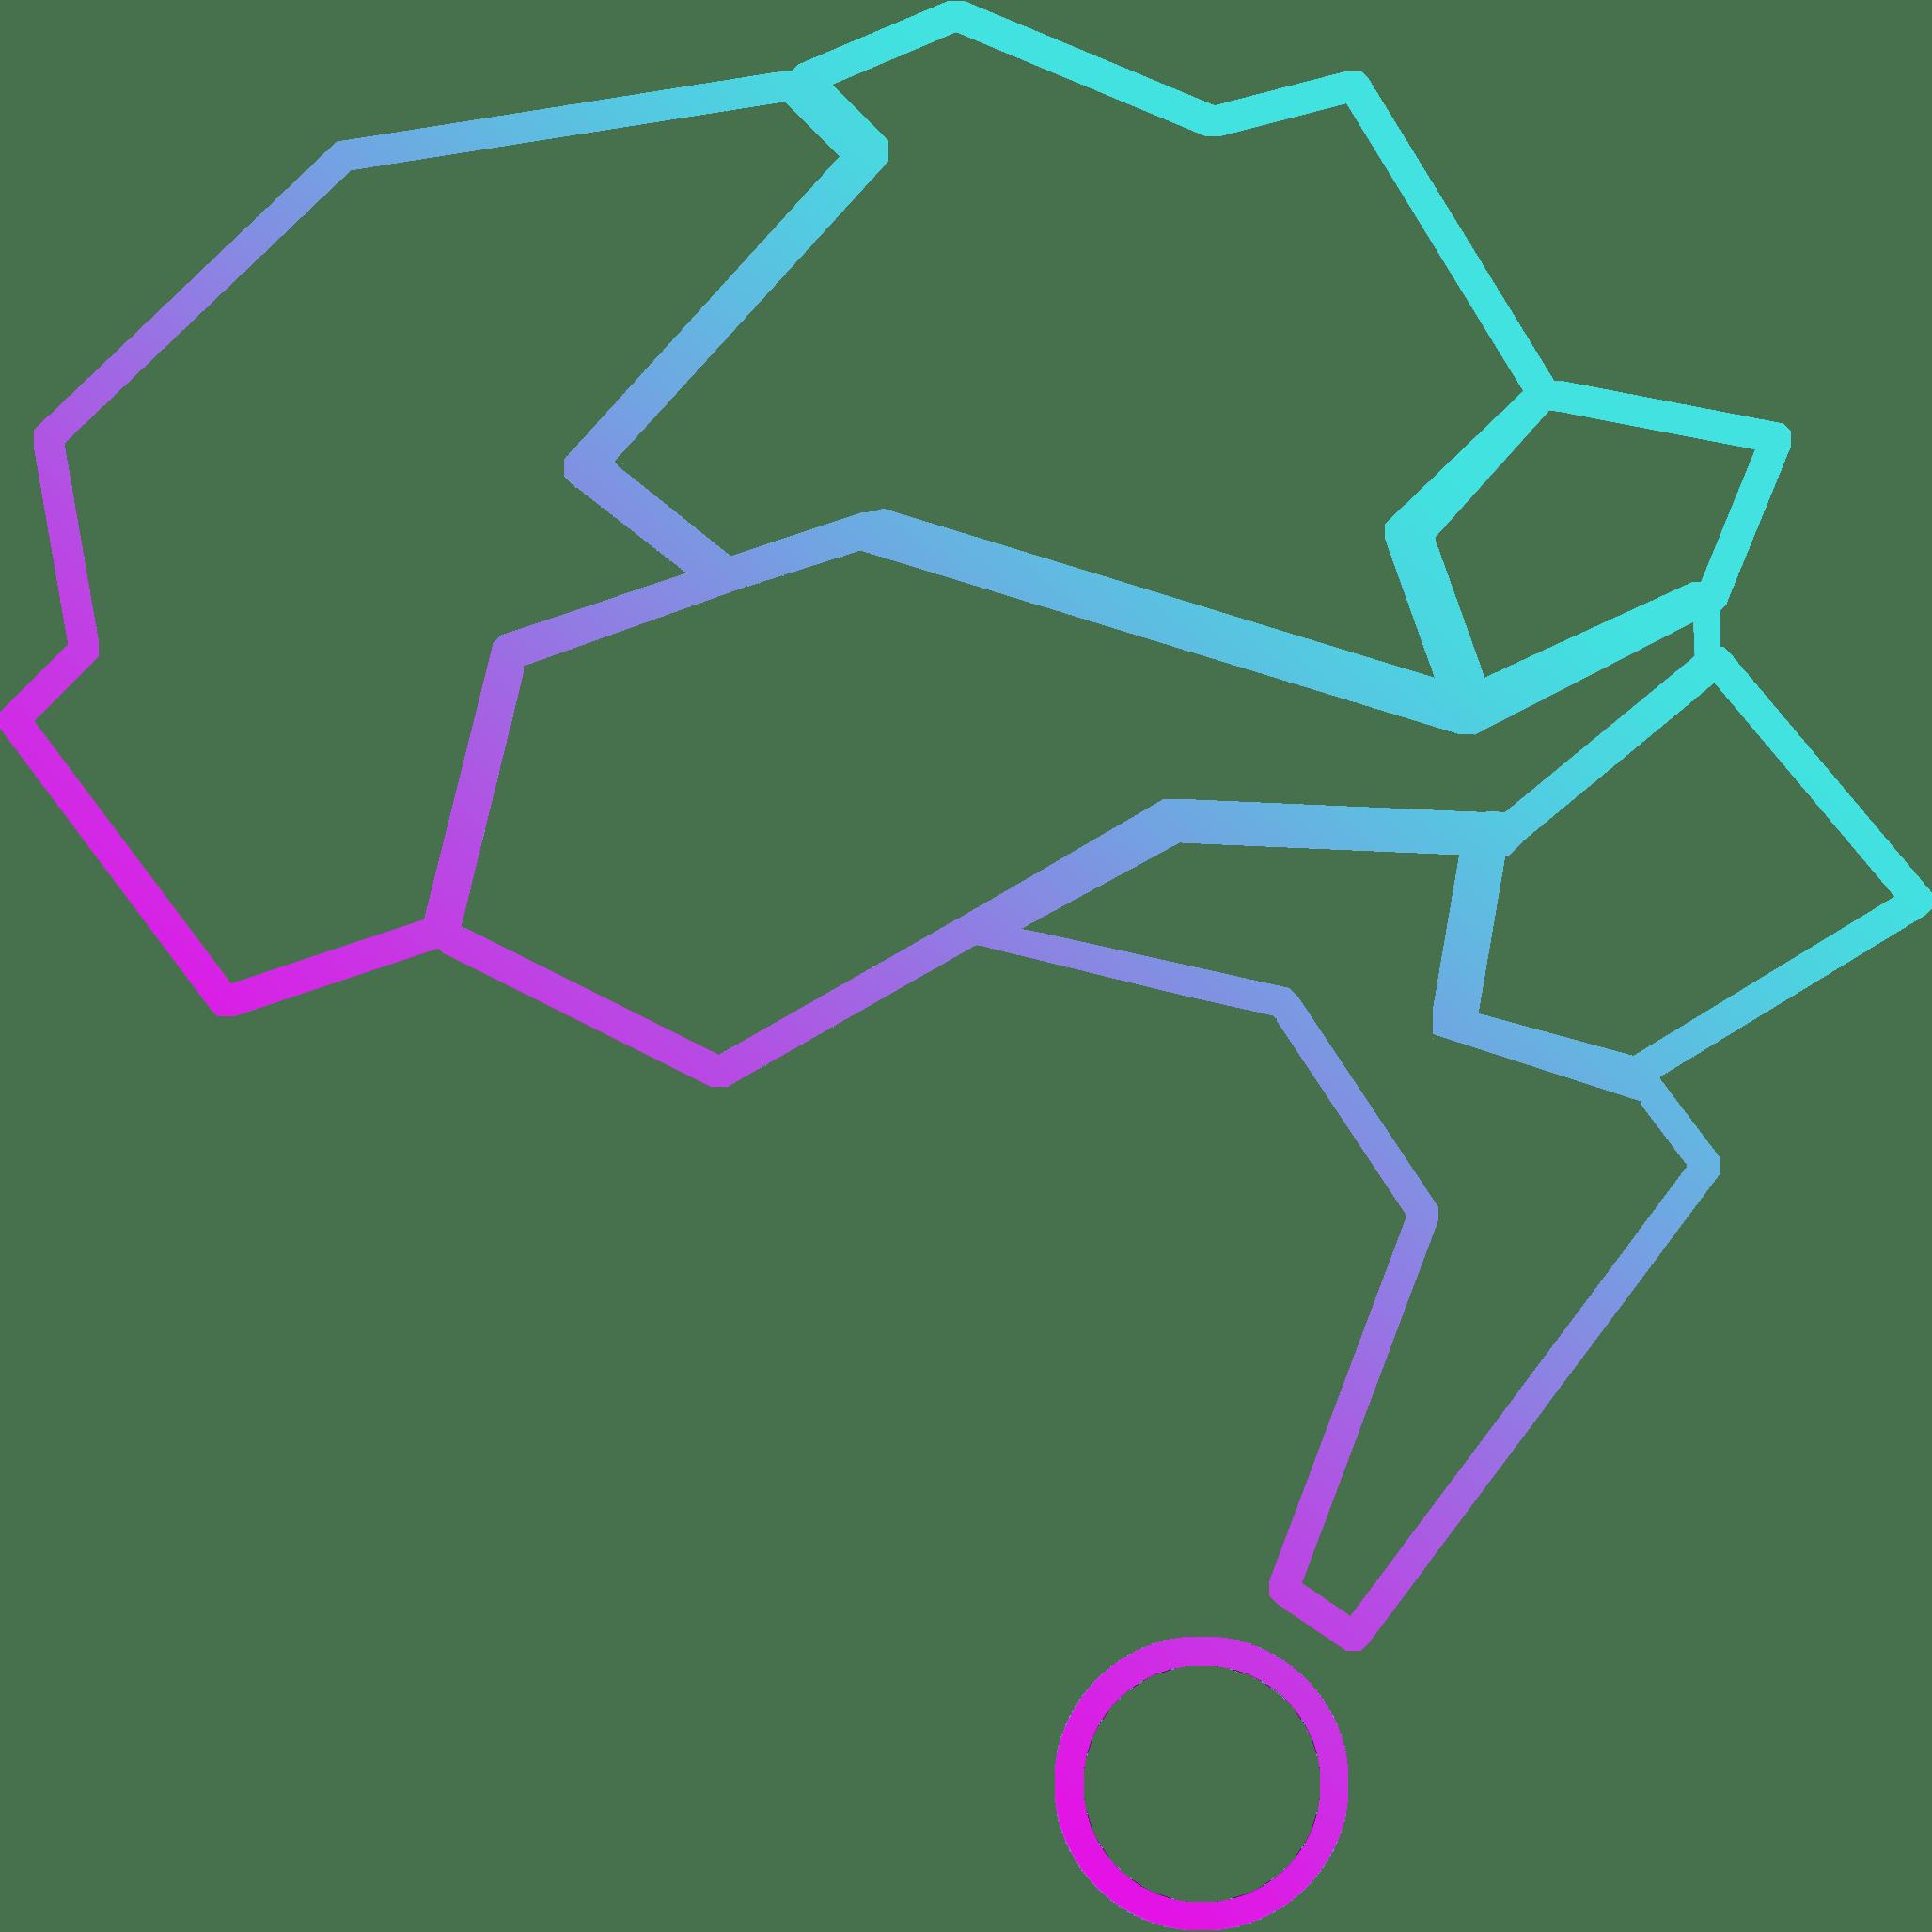 imagineware-solutions-logo